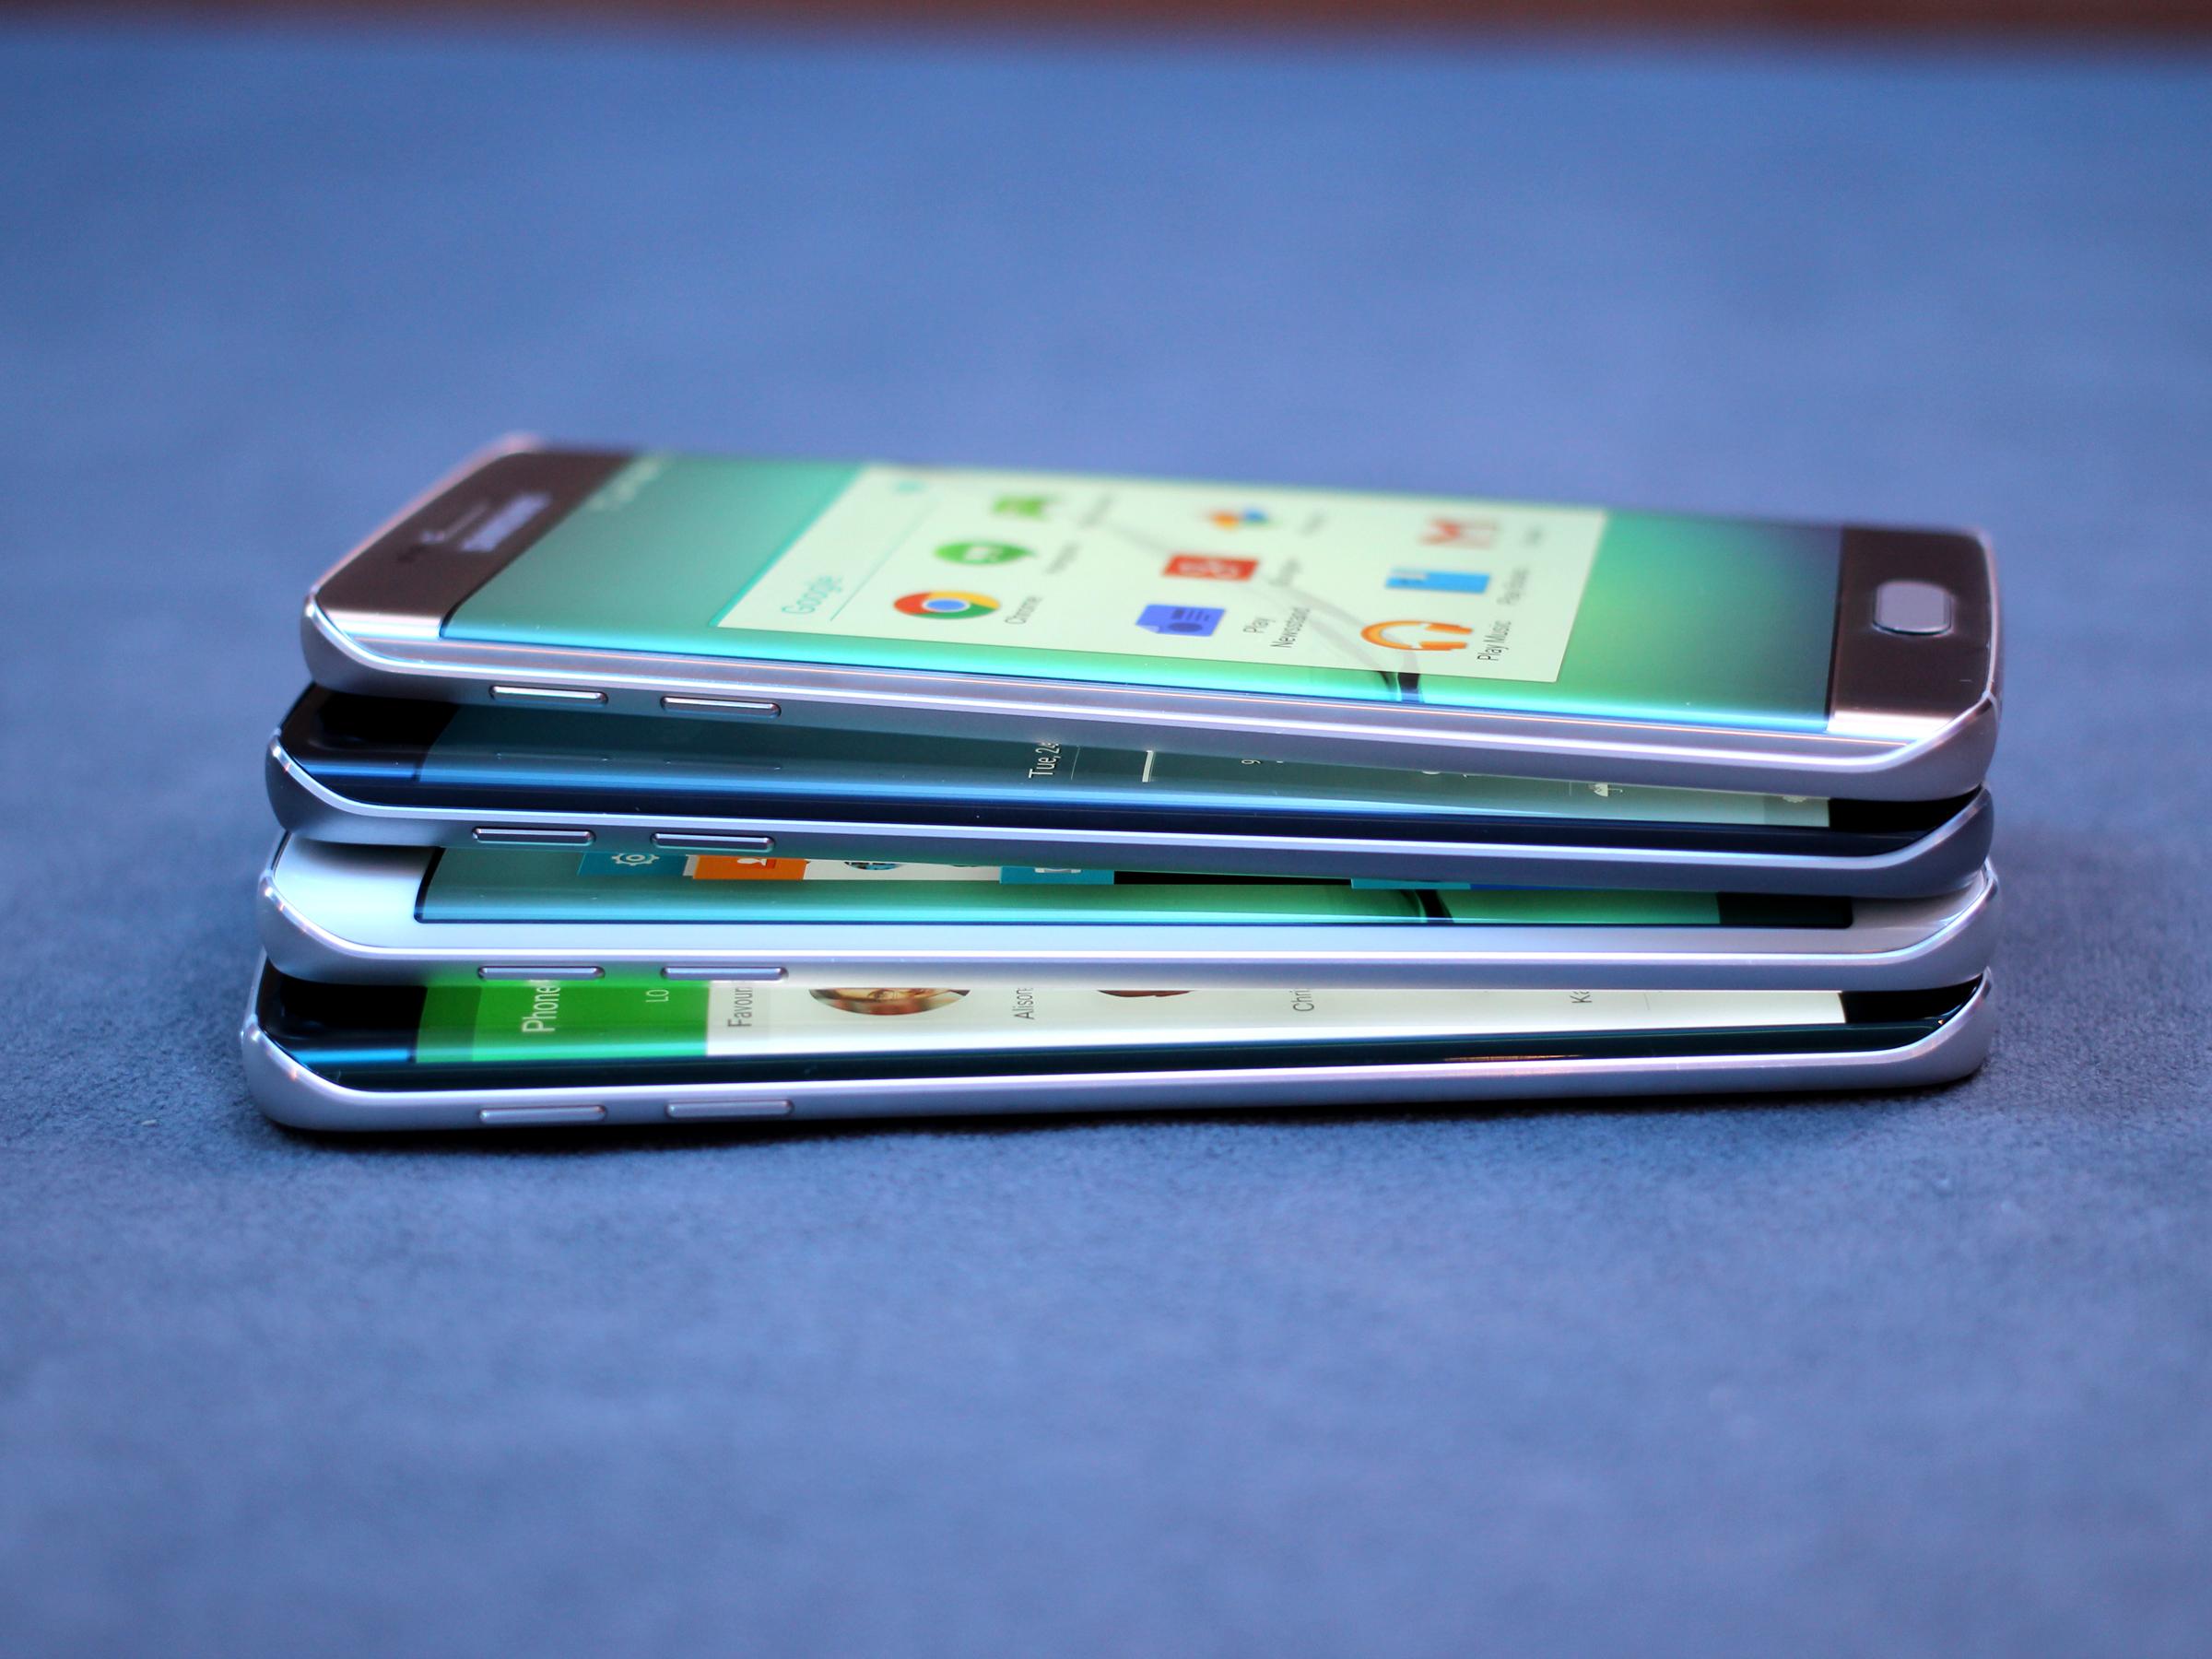 Лучший смартфон 2016. Samsung Galaxy S6 Edge